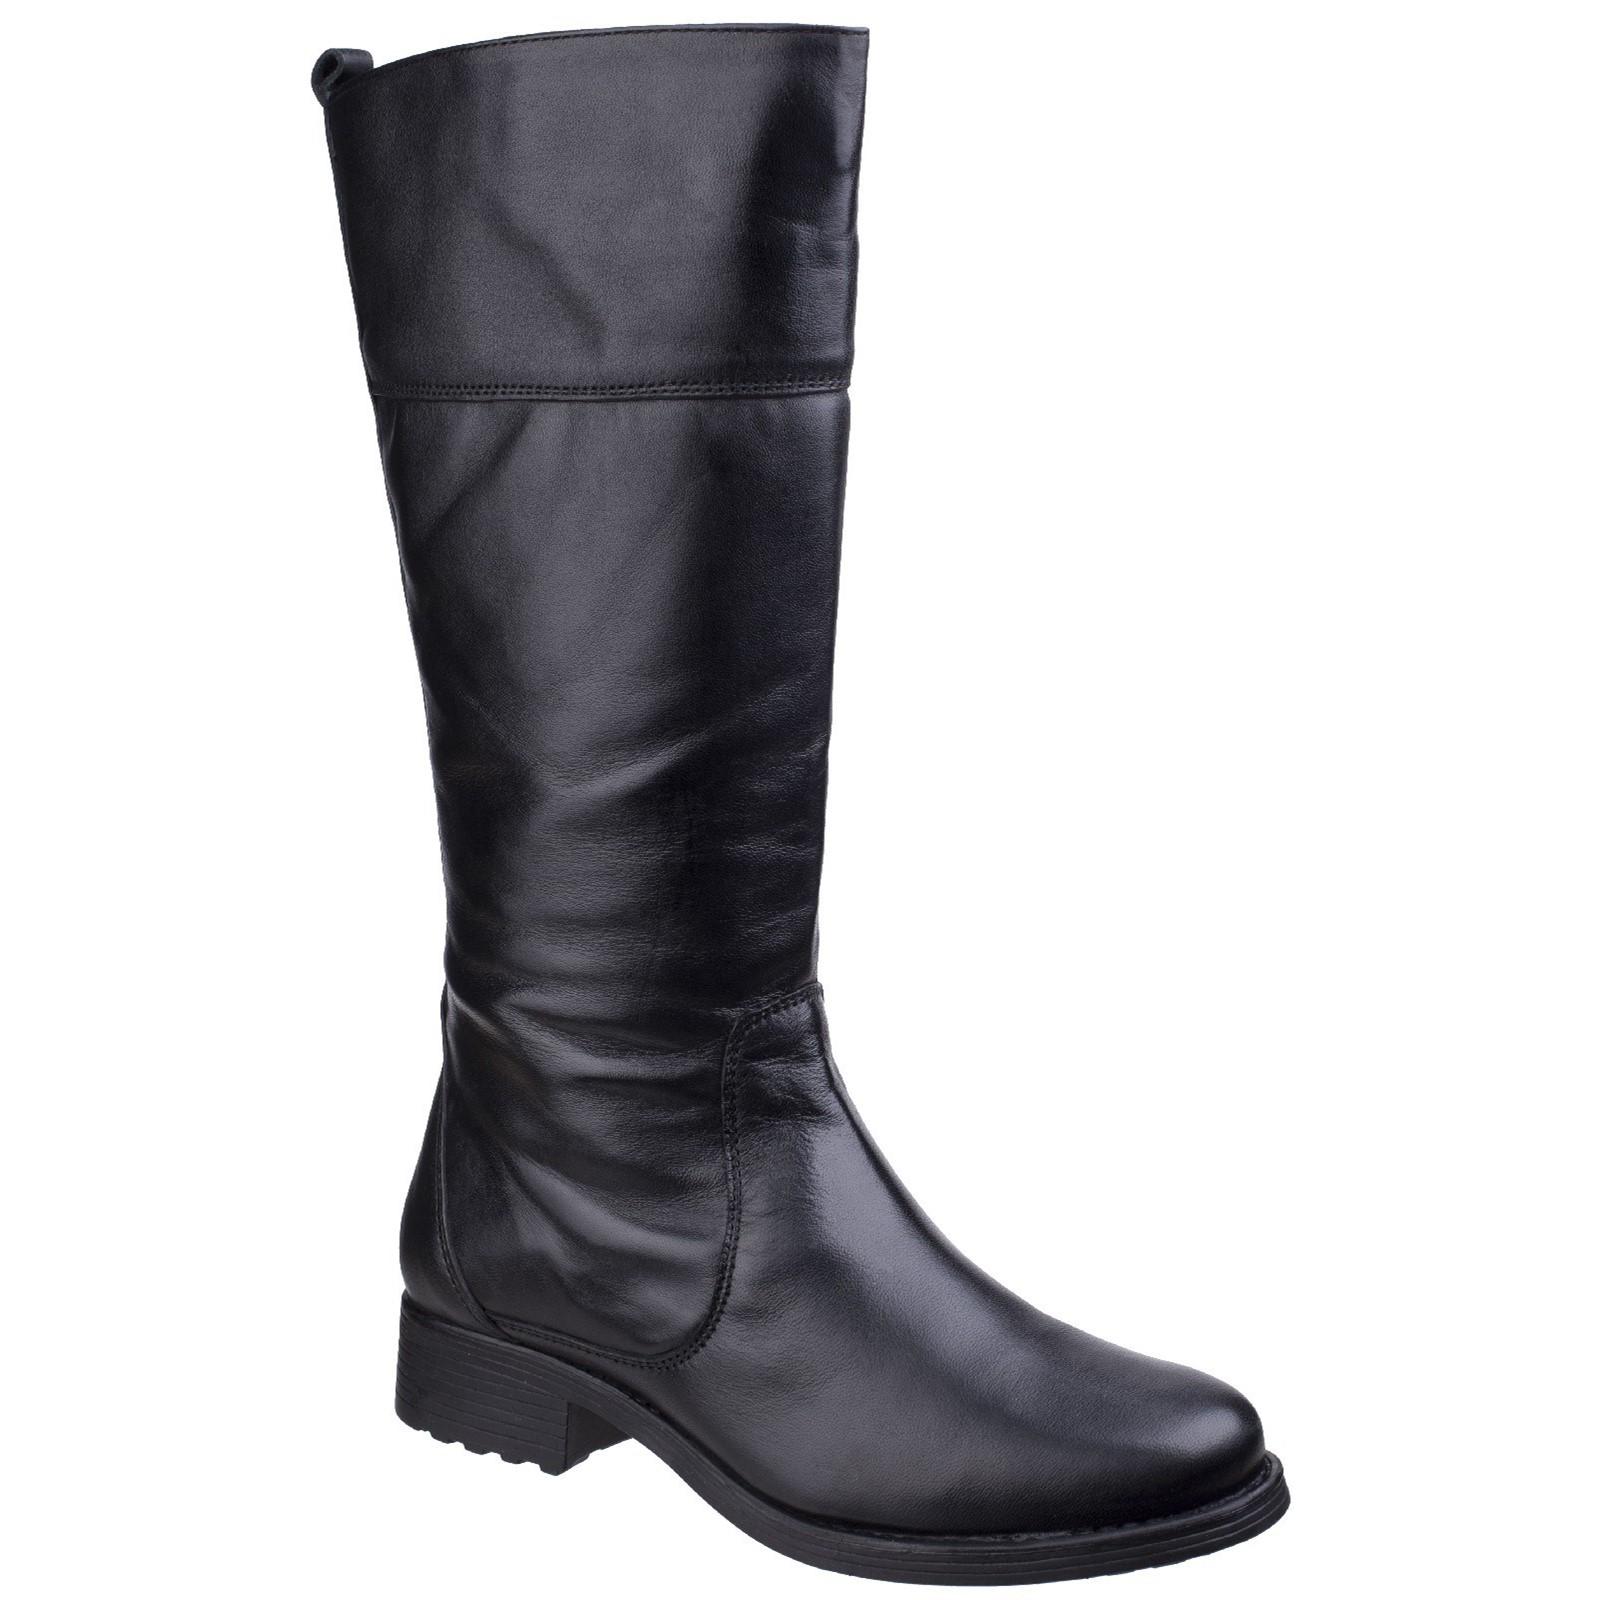 Fleet & Foster Dorcester Damen Zip Slipper Stiefel Lederstiefel Damenschuhe